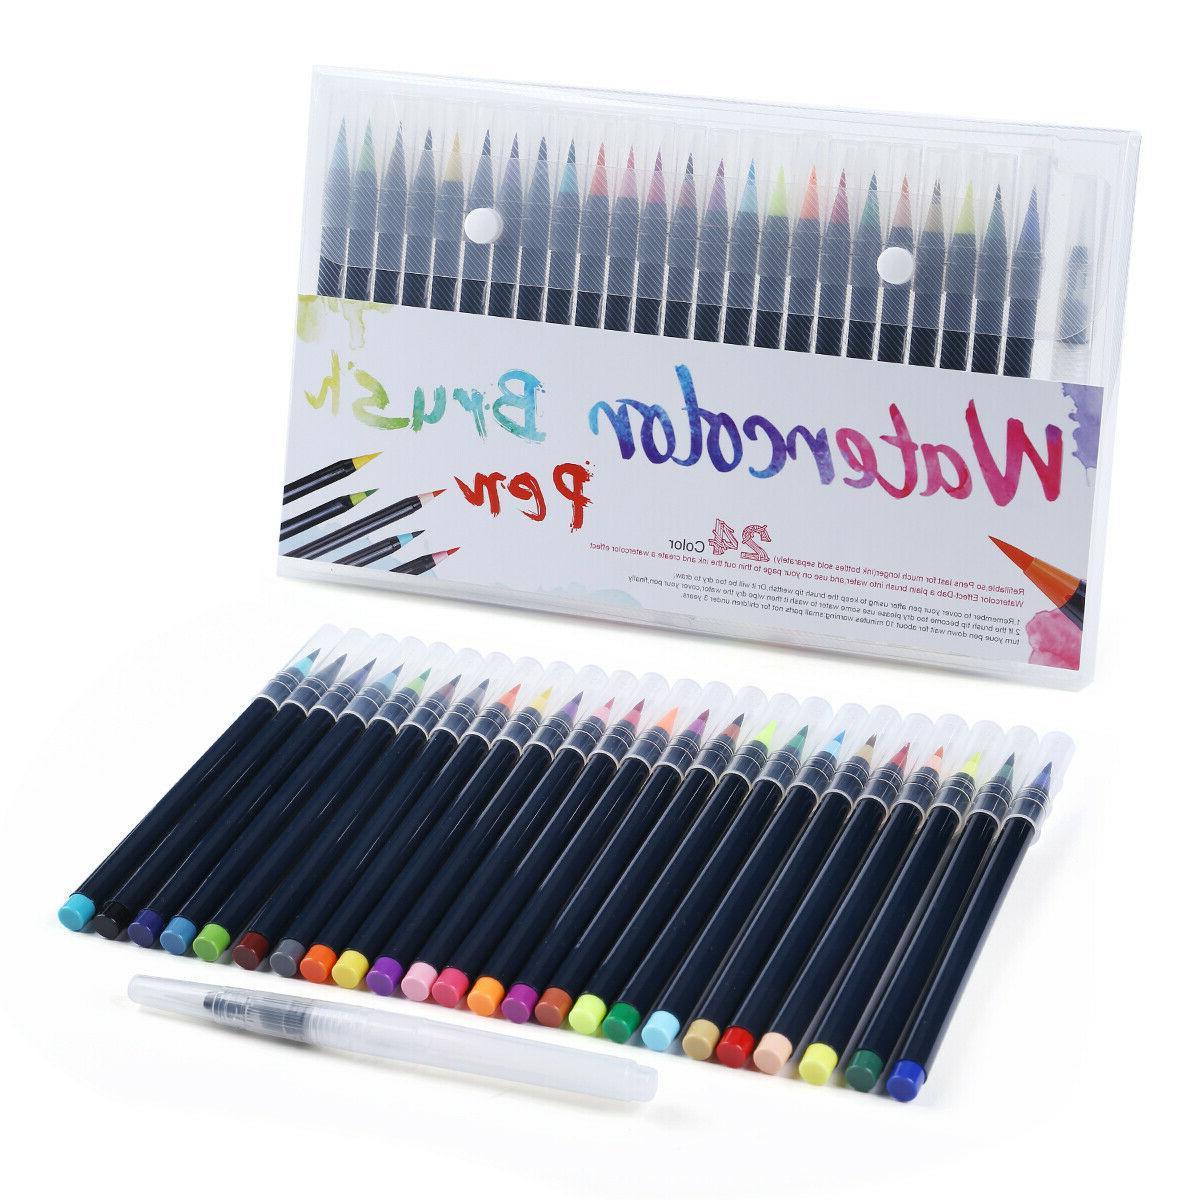 Watercolor Brush Pens Set 25pcs Water Paint Markers Coloring